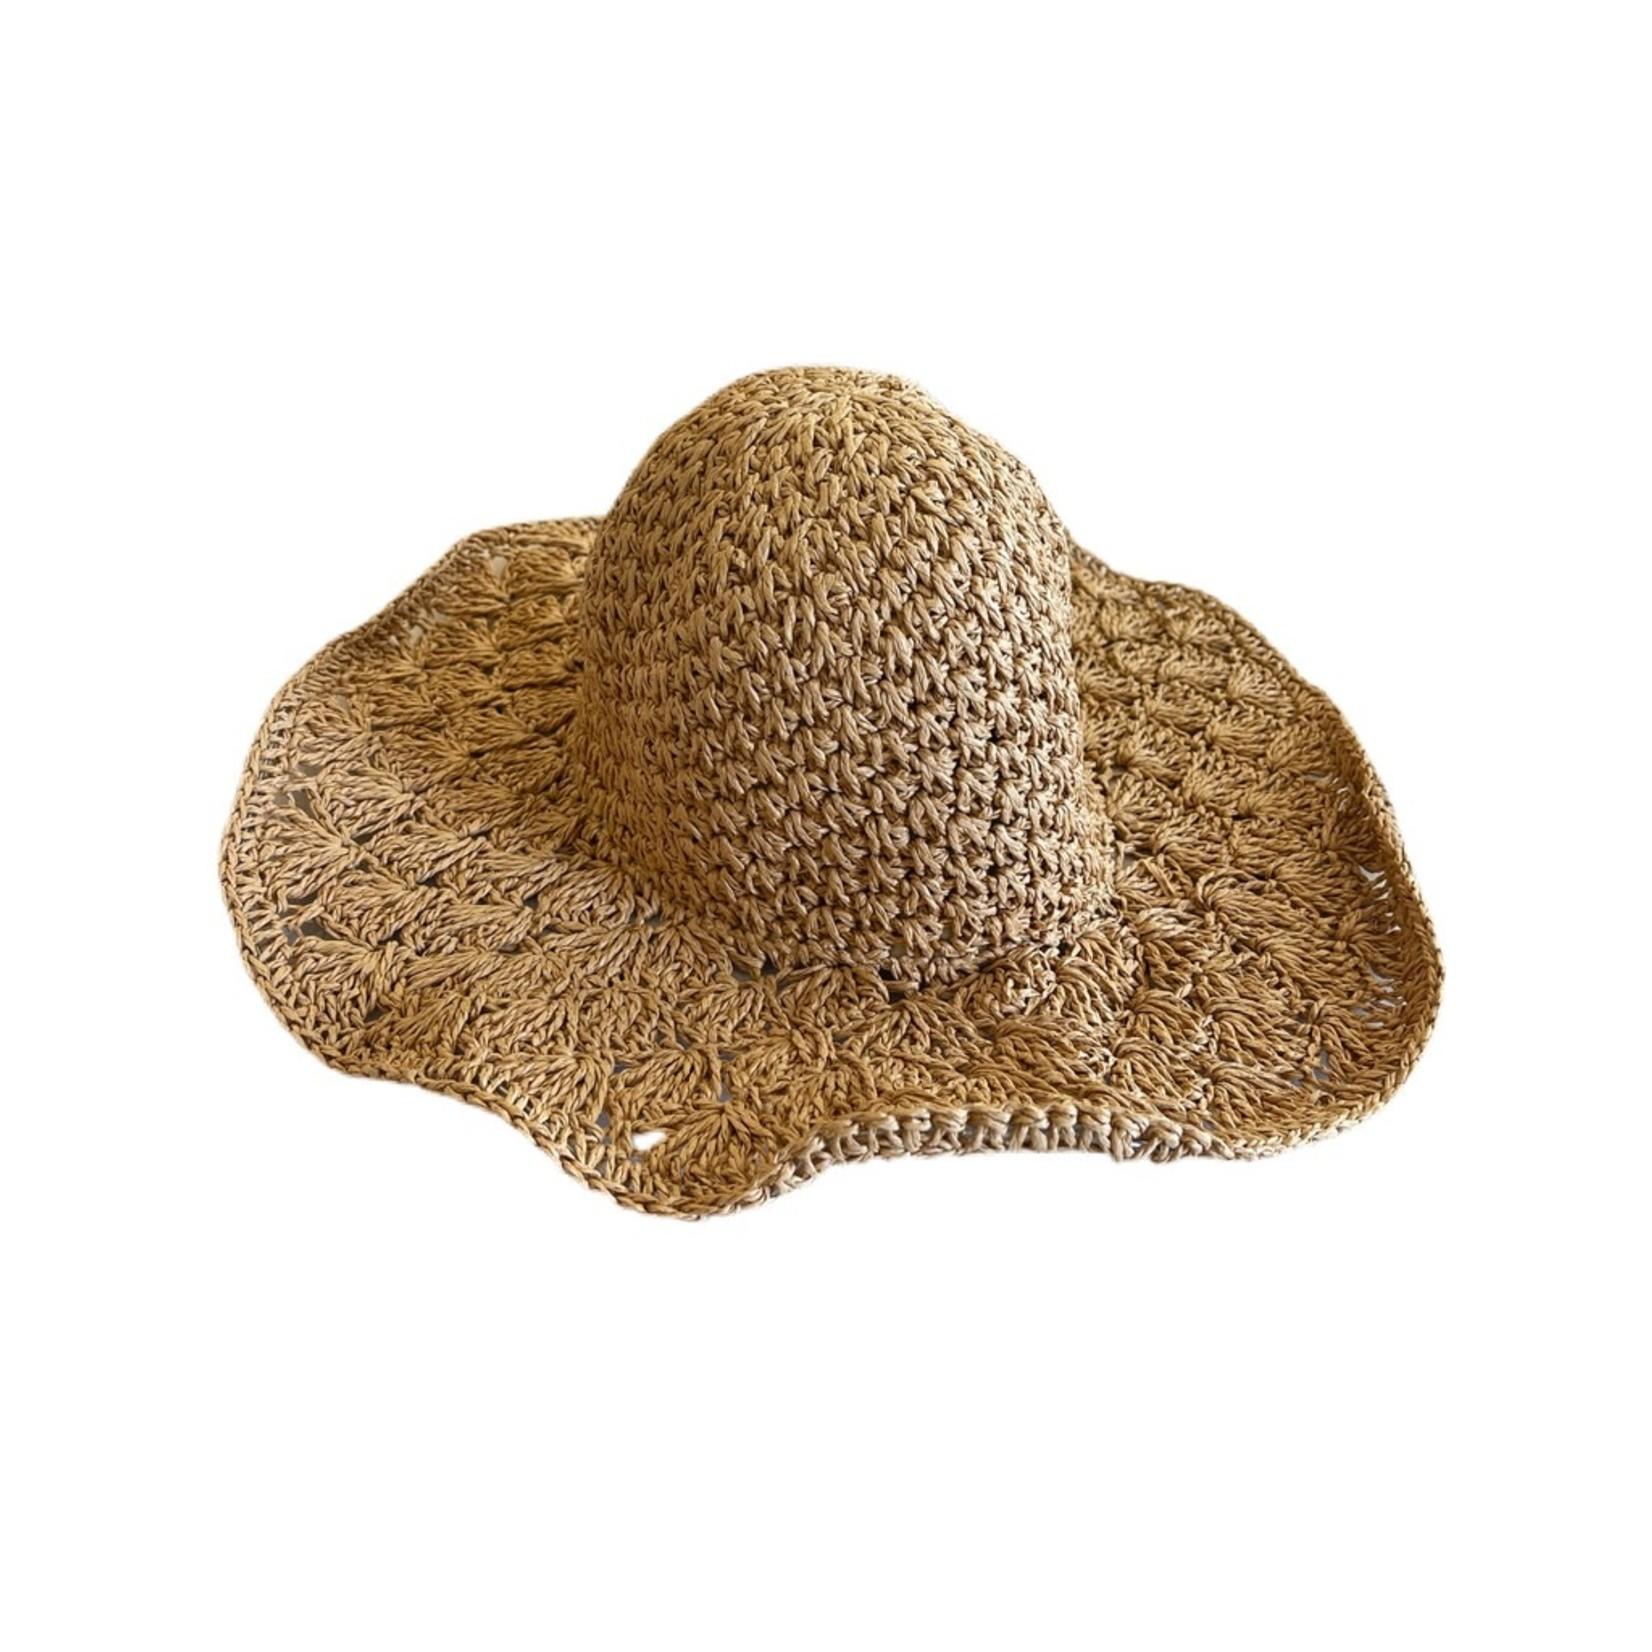 Wyld Blue Raffia Flopper Boater Hat